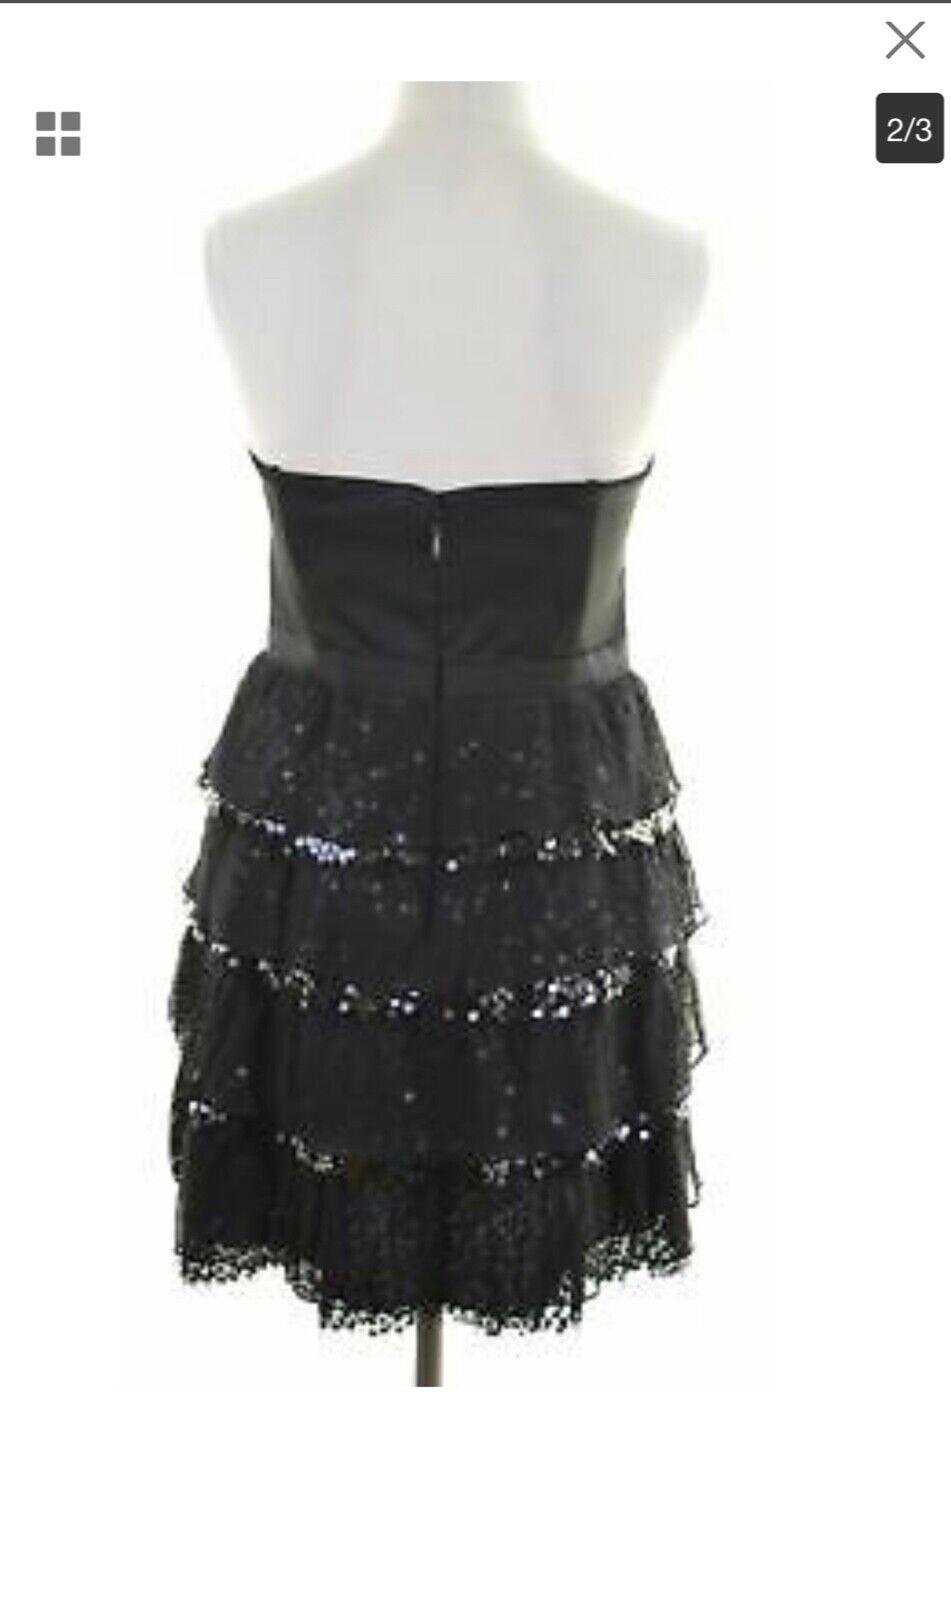 Bcbg max azria kleid.schwarz.gr. 38 M Neu NP 380 Party cocteil dress